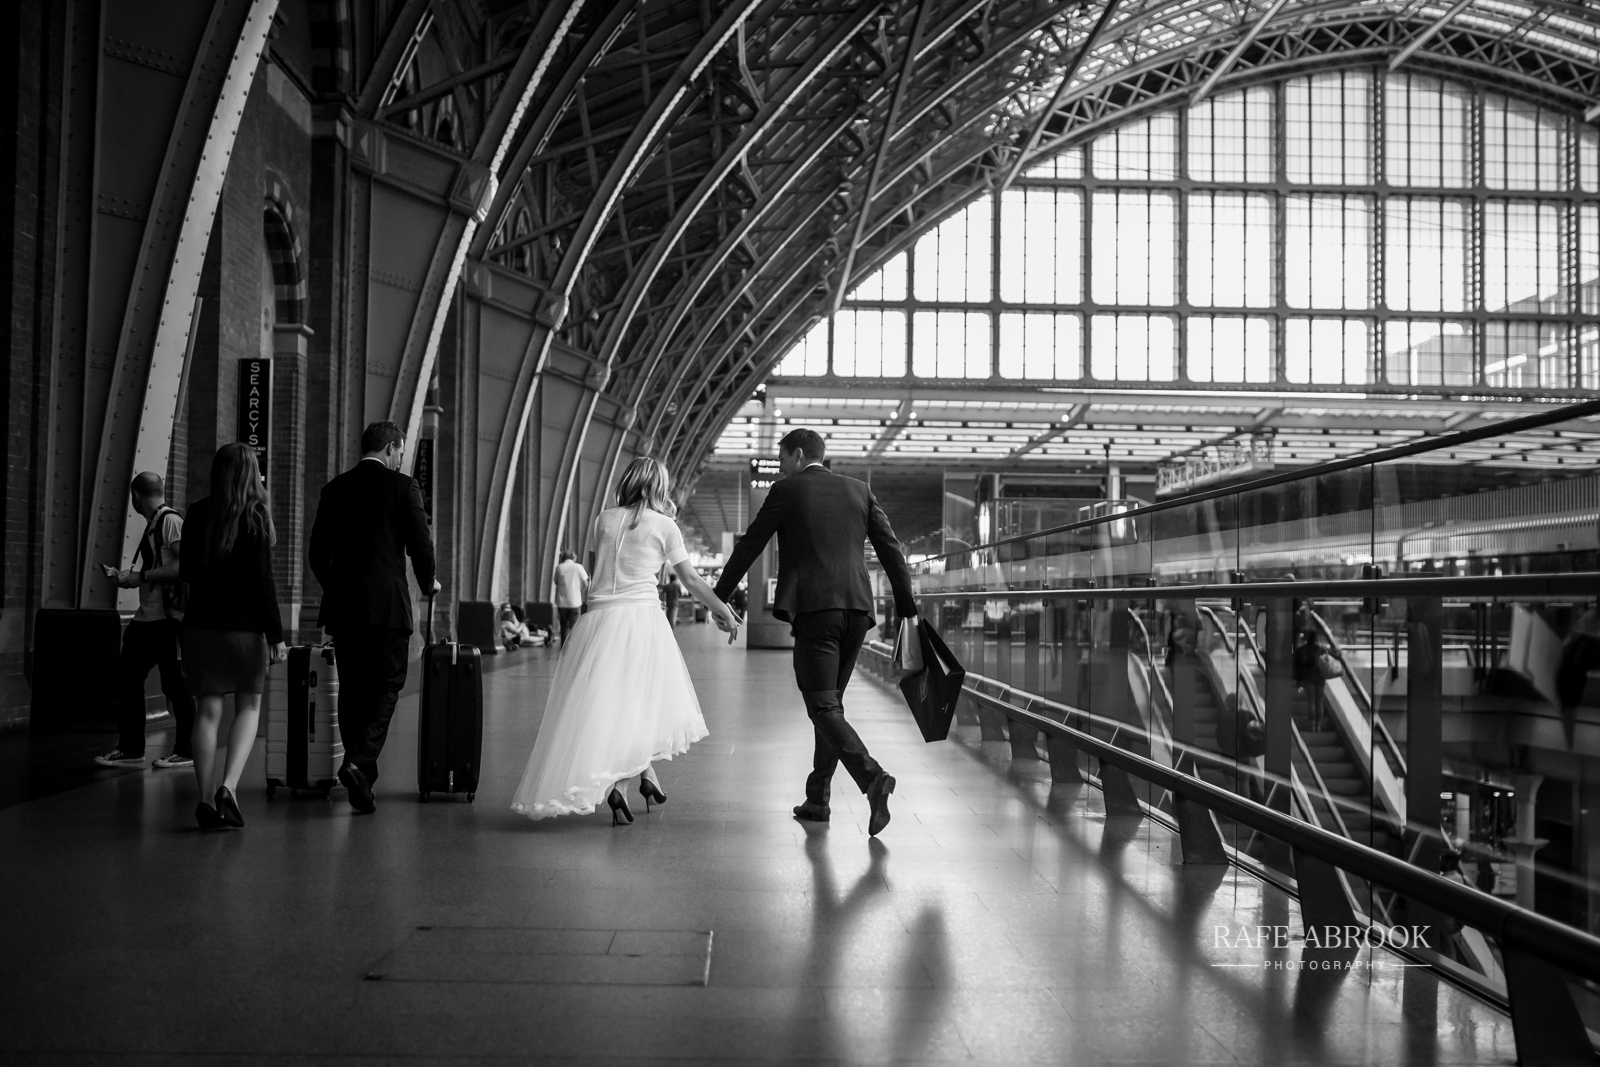 wedding photographer hertfordshire london st pancras renaissance hotel station grand staircase-1265.jpg